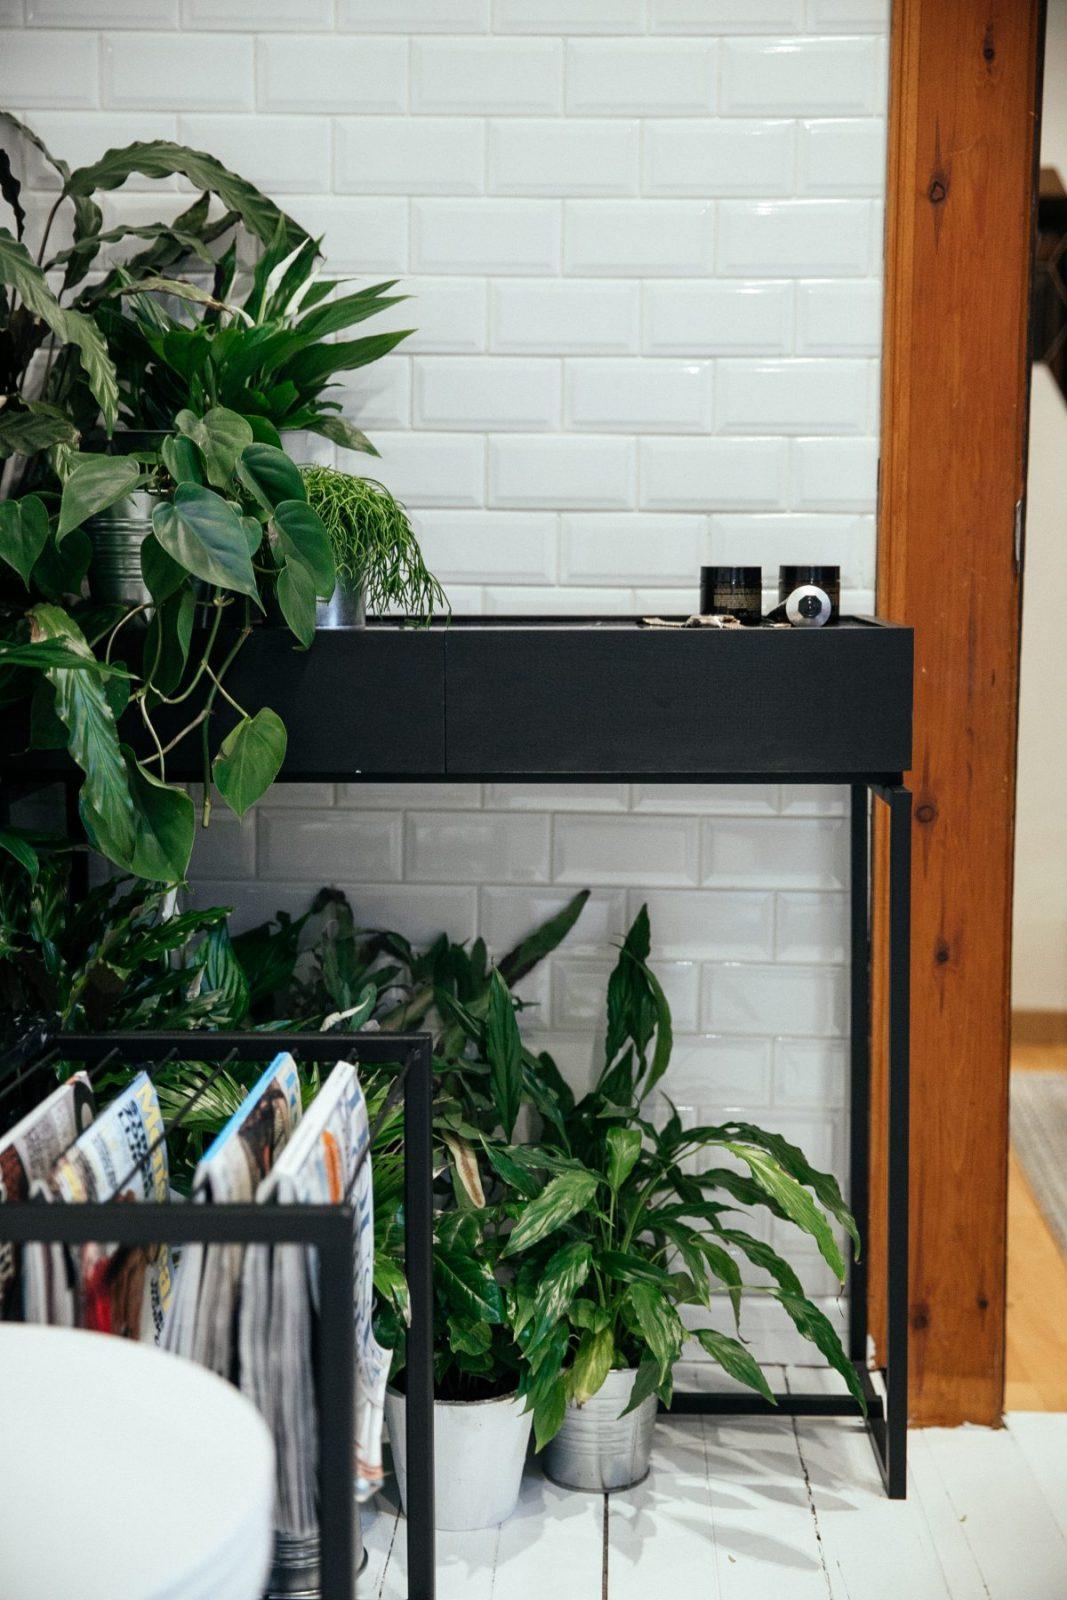 Beau Tags: Bathroom, DIALECT, Hang It, Jungle Bathroom, JUNO, Plants In Bathroom,  Serax, White Bathroom